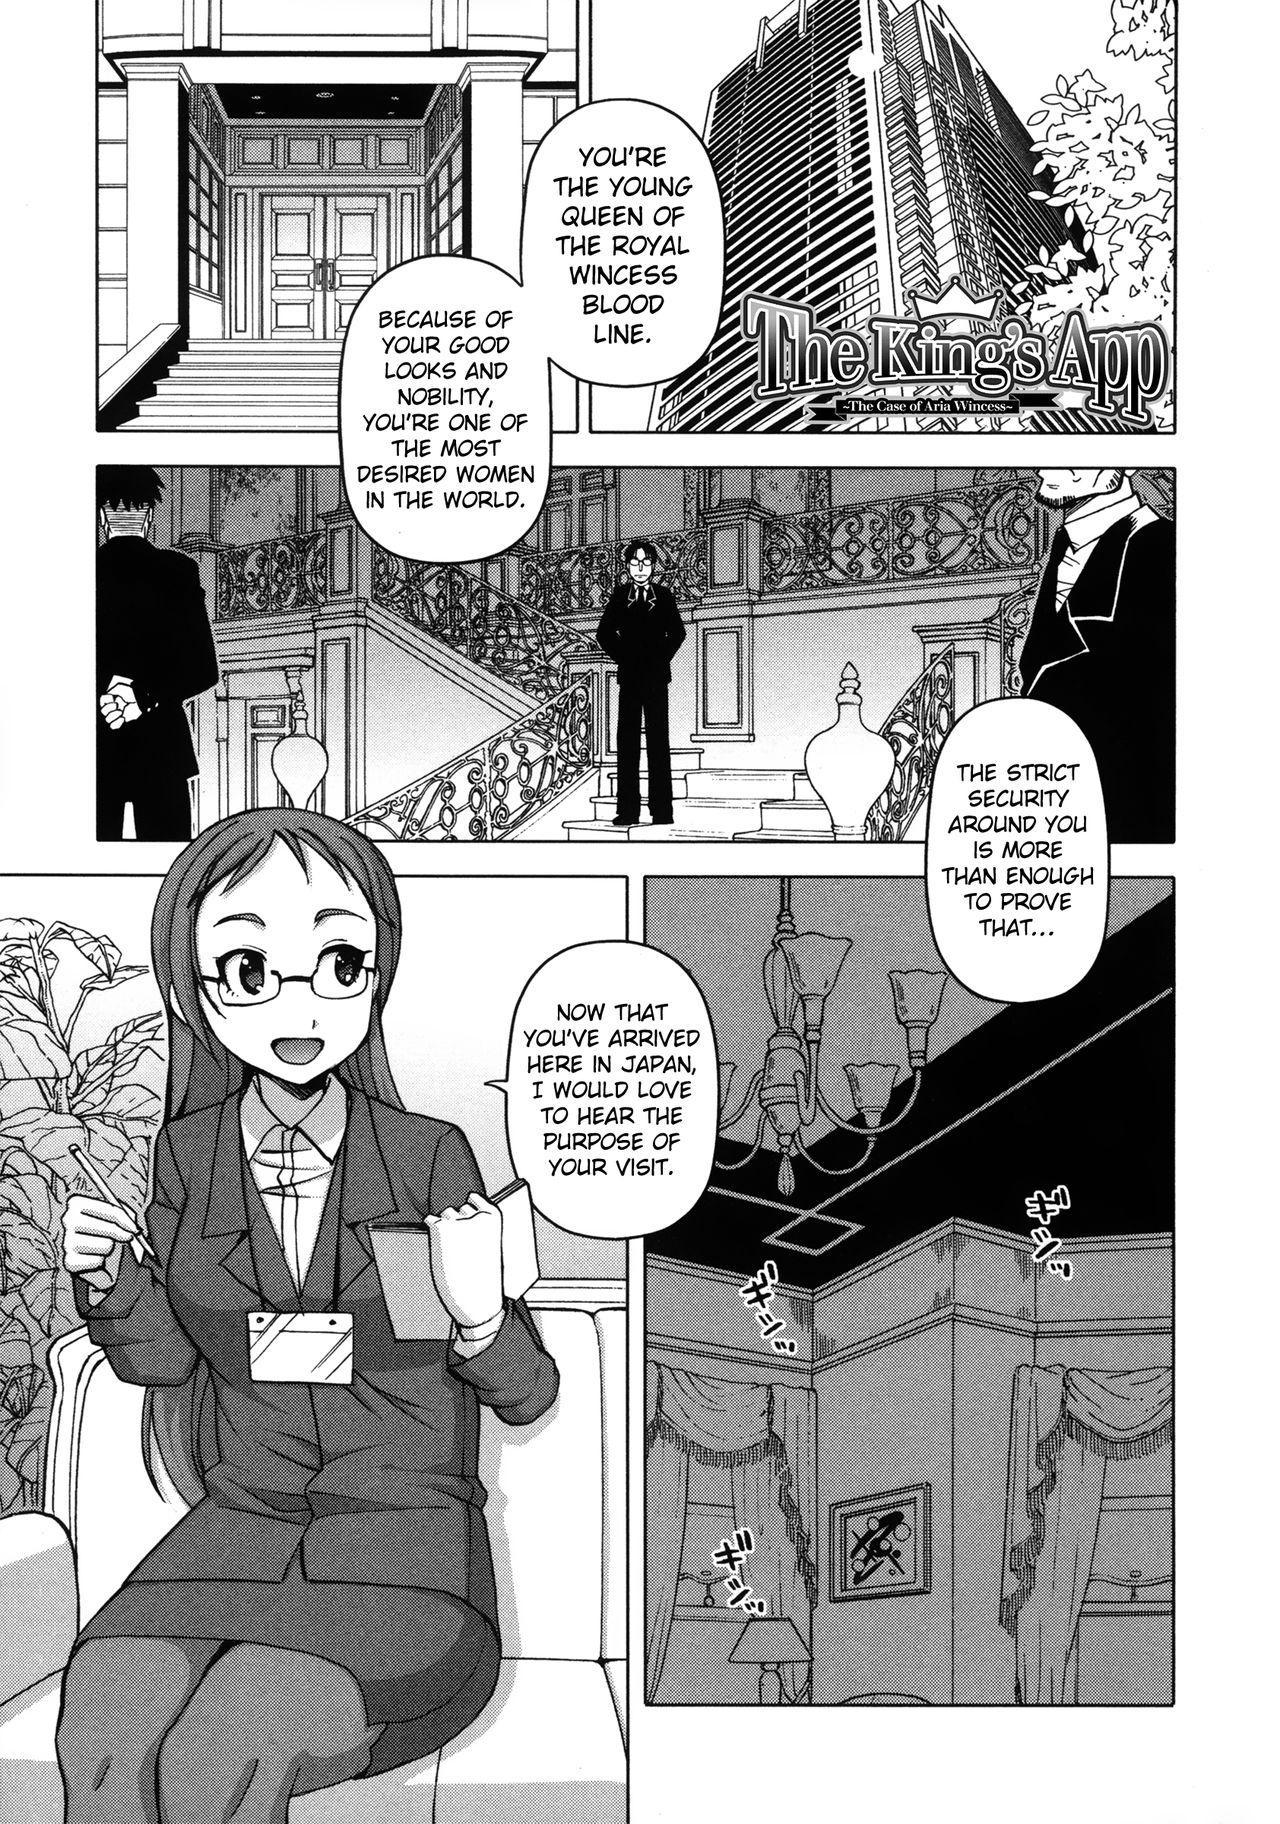 [Takatsu] Ou-sama Appli - King App [English] [TheRobotsGhost] 196